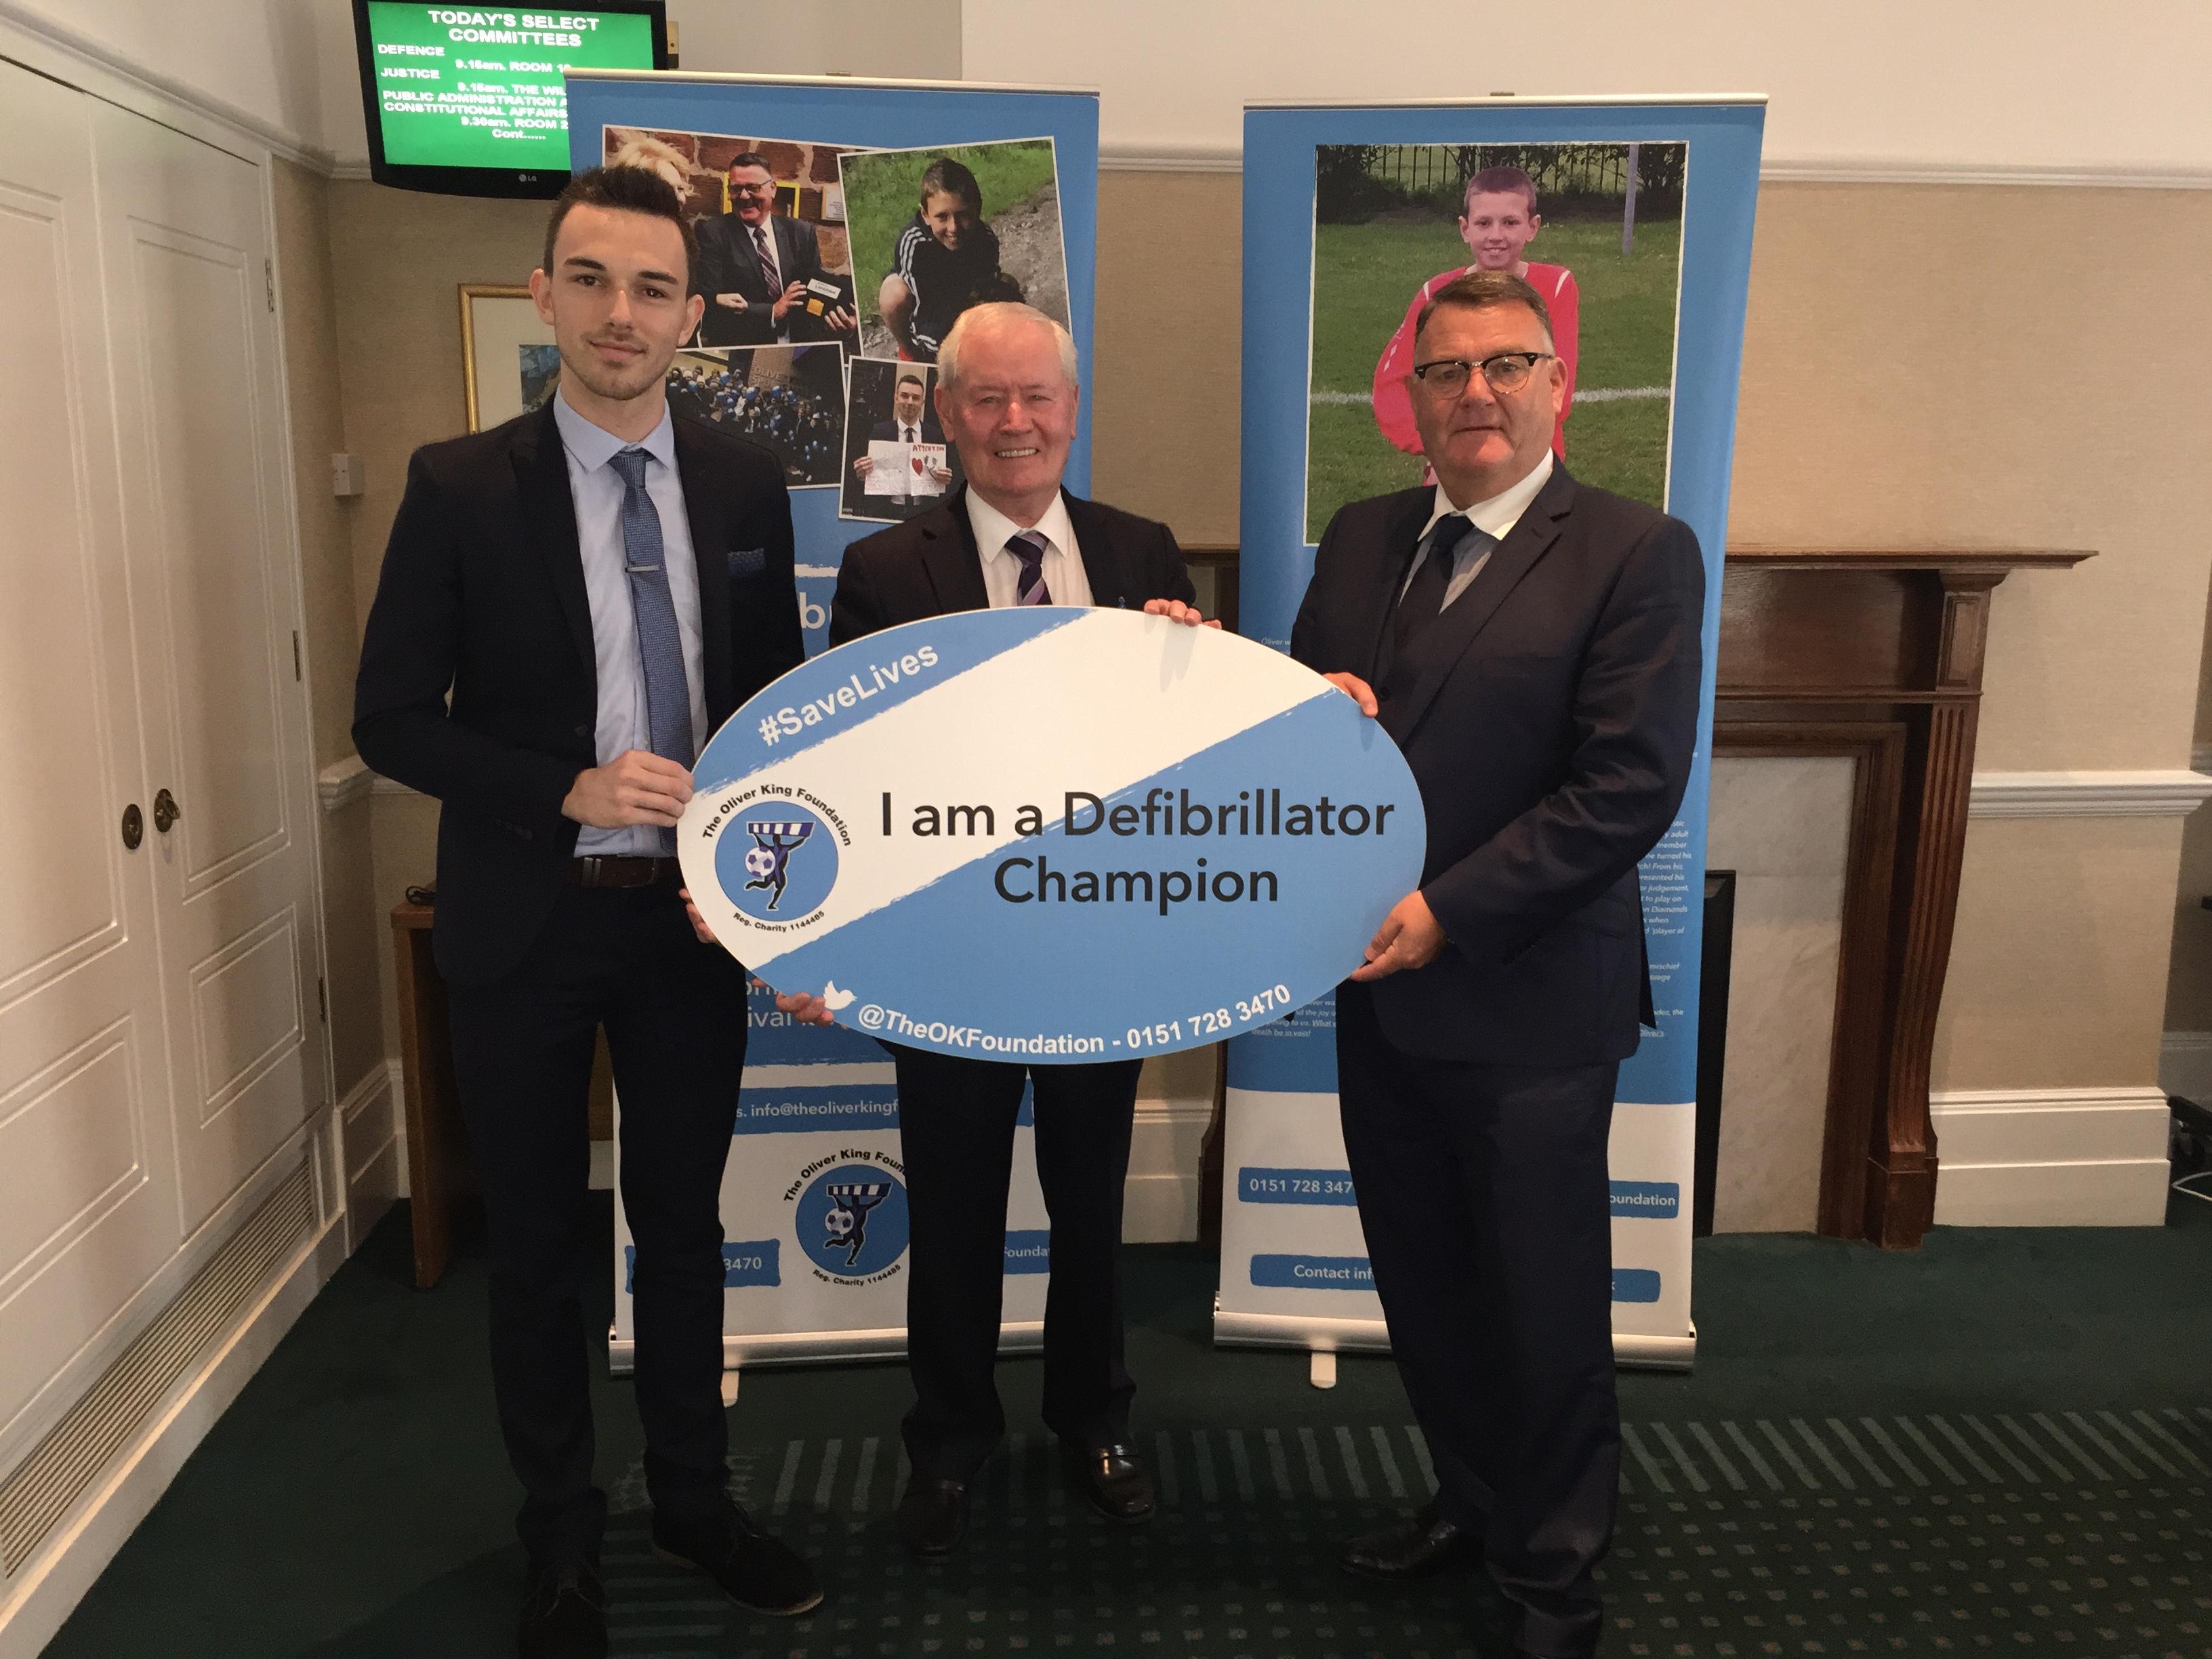 Defibrillator_Champions_-_Jim_Cunningham.jpeg